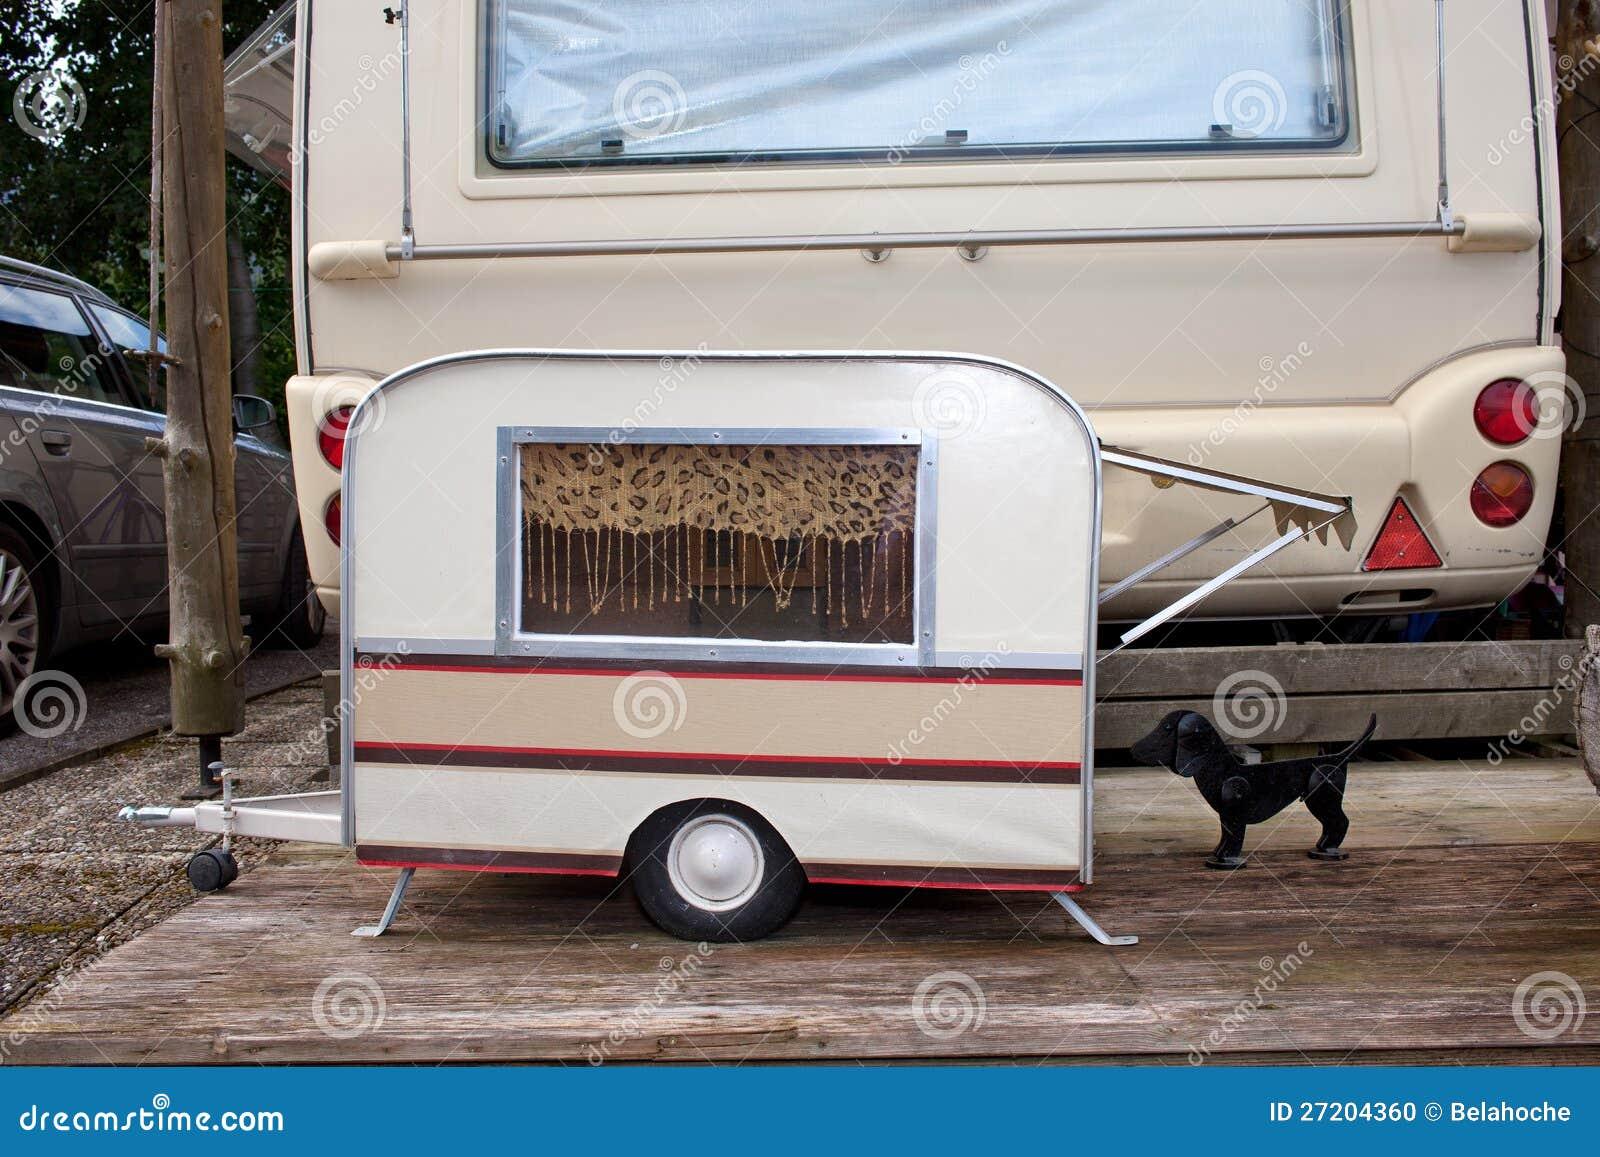 Tiny Model Caravan For A Dog Stock Photo Image 27204360